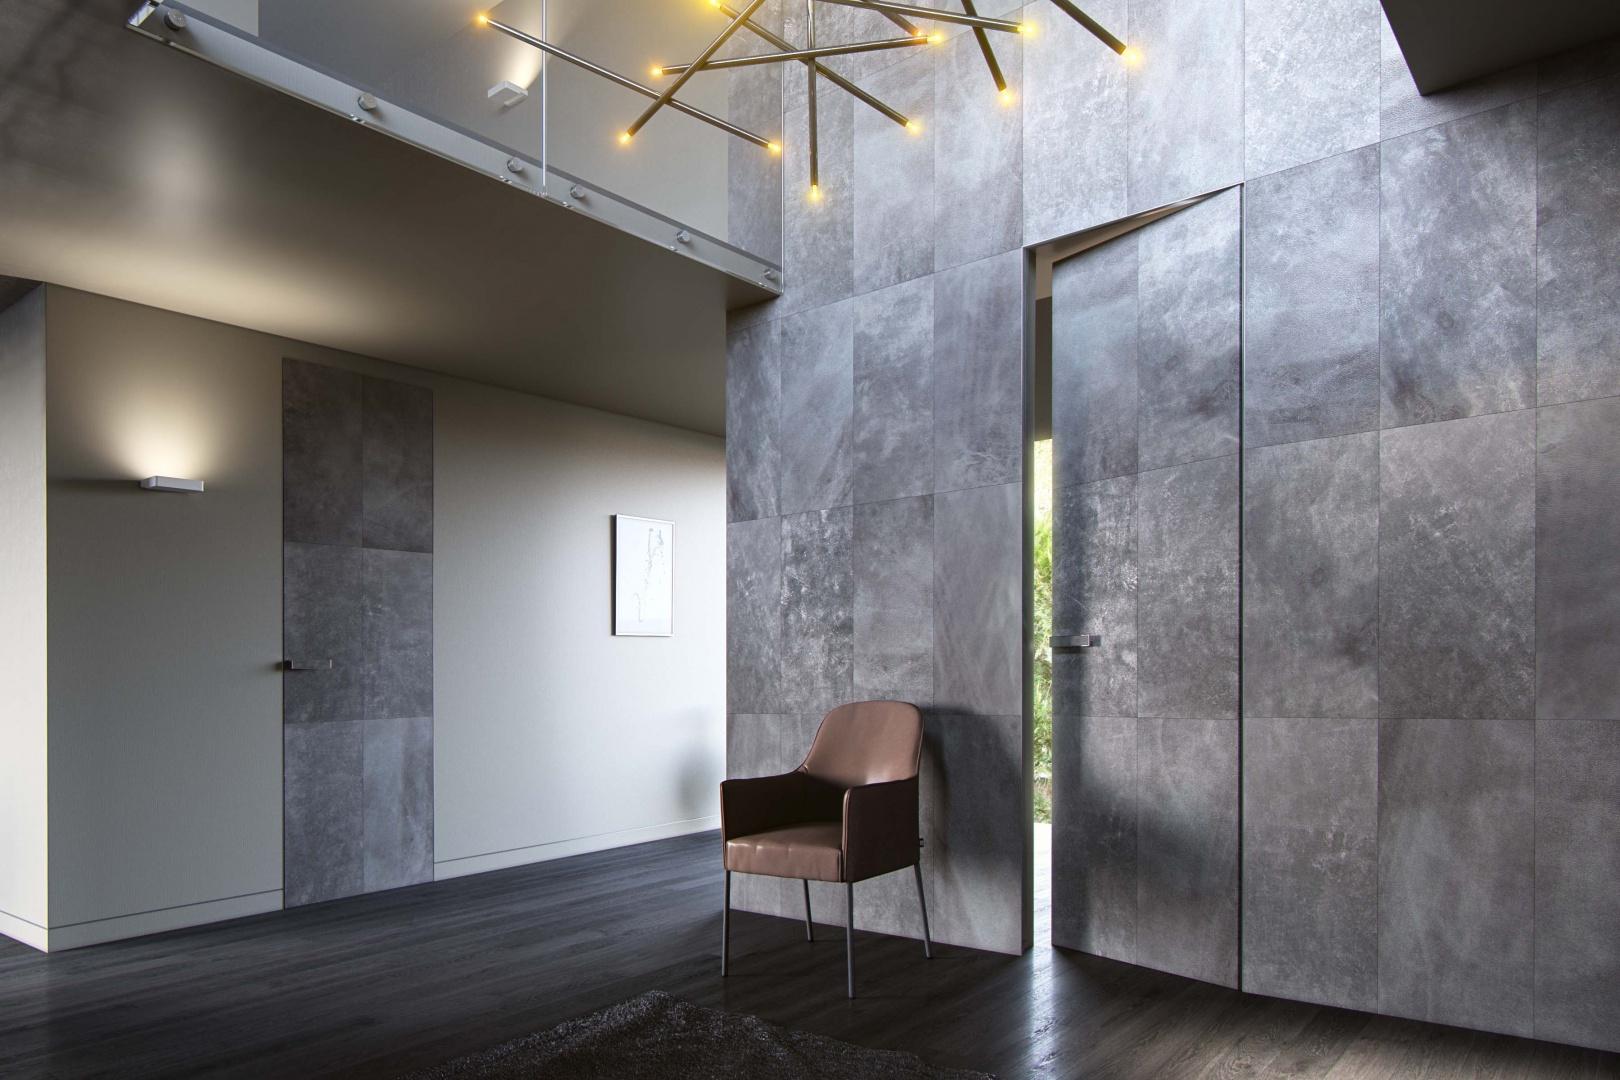 Drzwi z kolekcji skóra Graf - PIU Aluminium Line/Piu Design